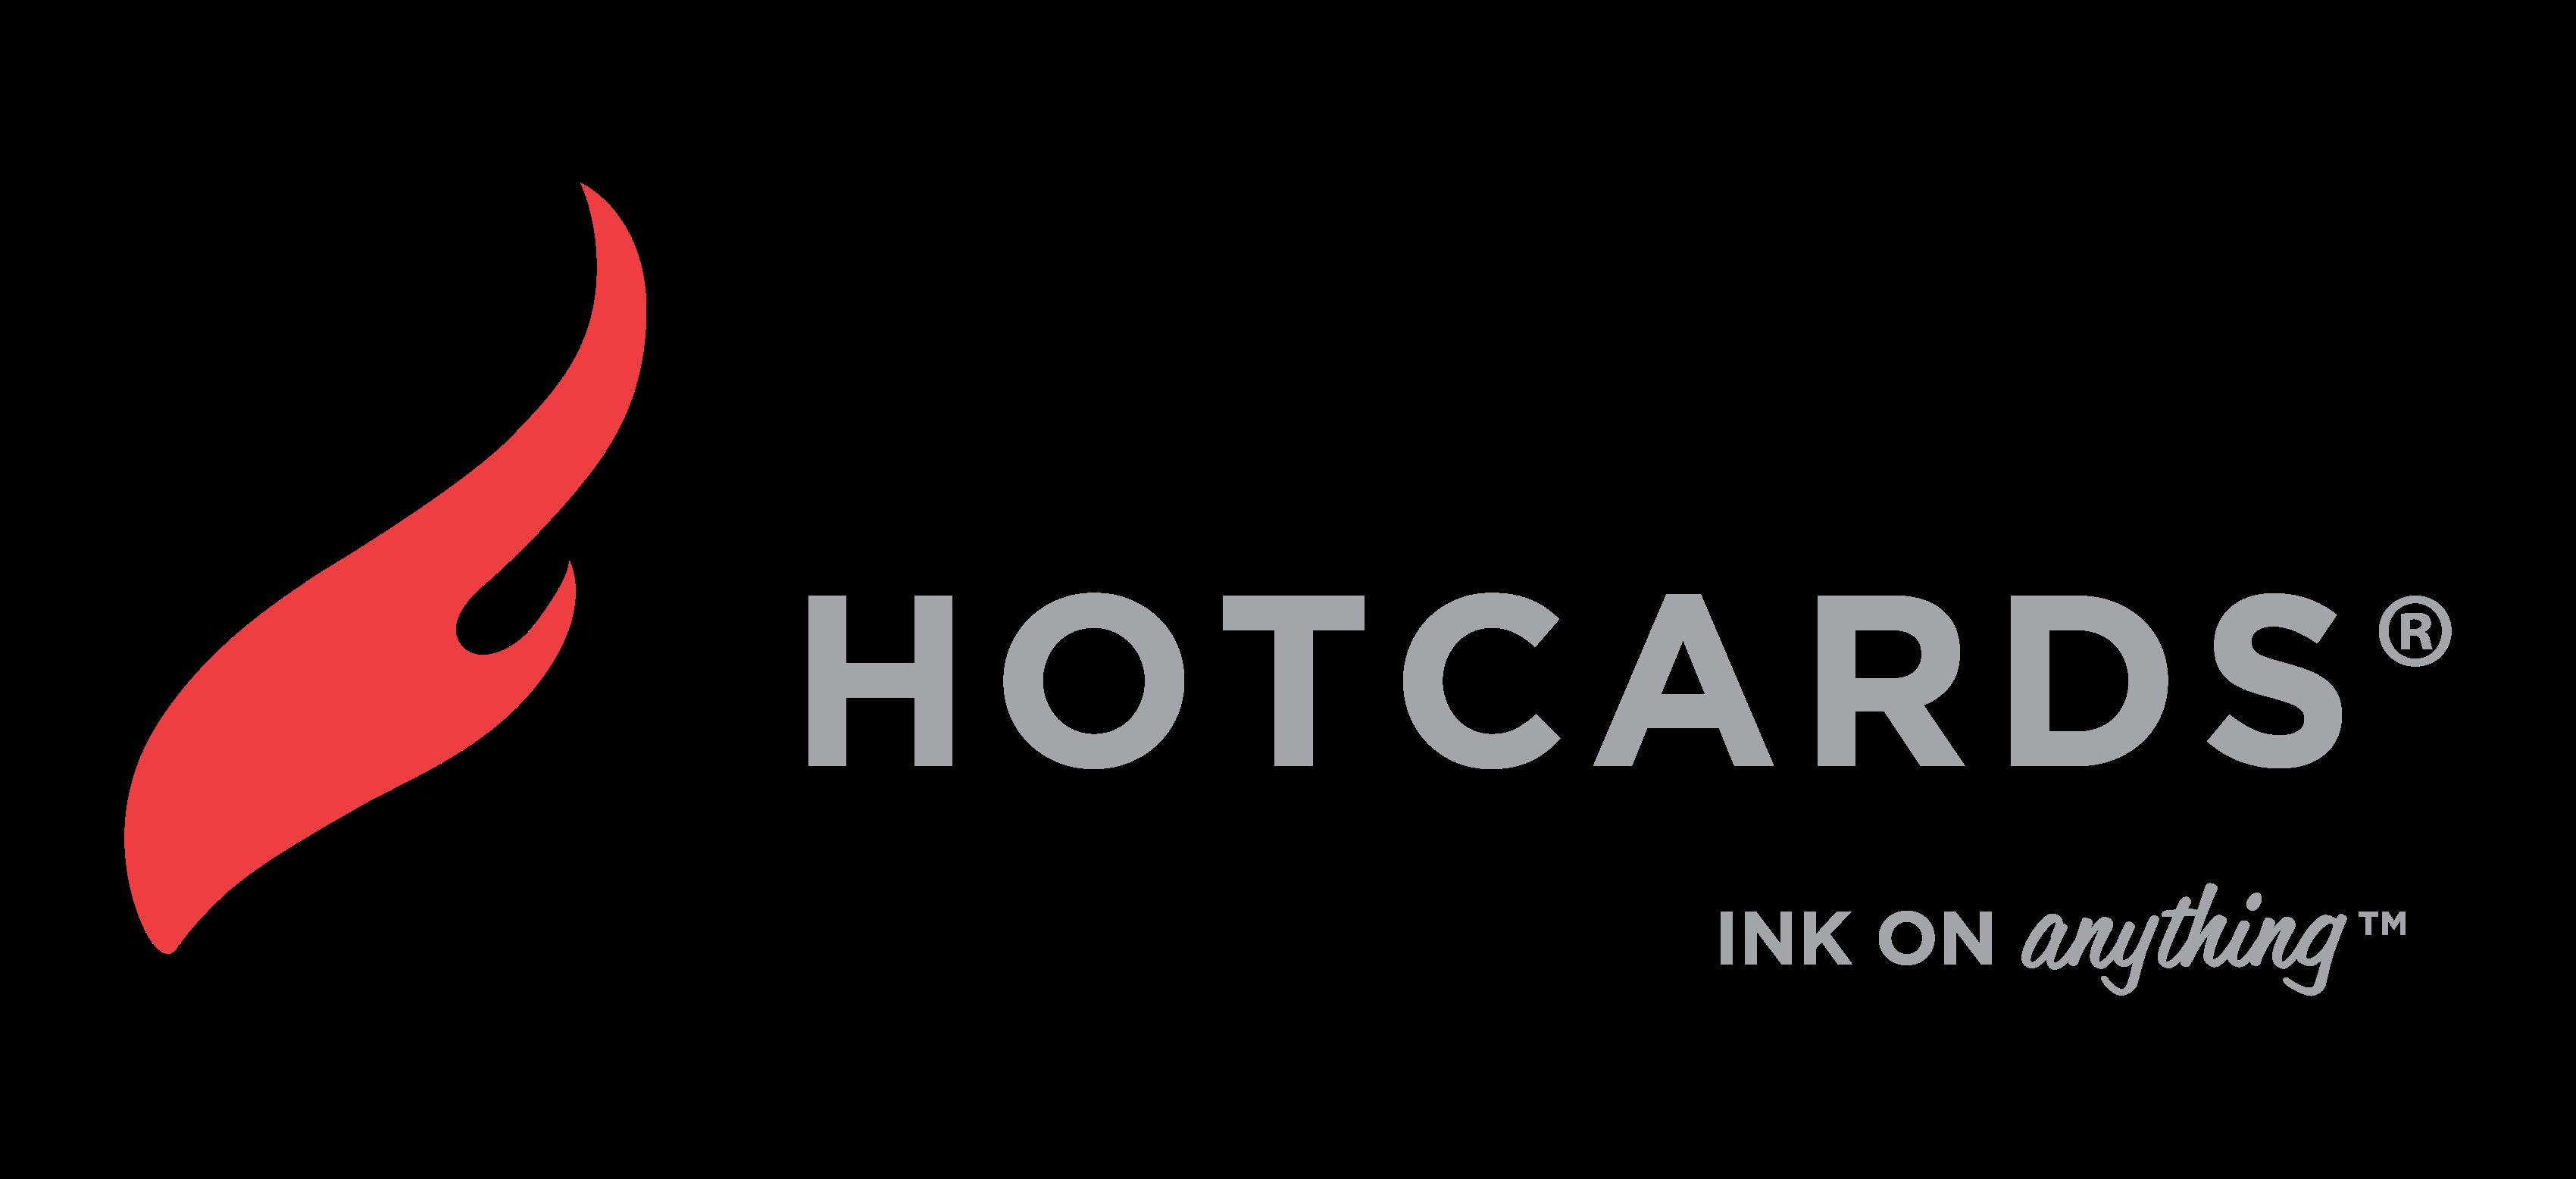 Hotcards